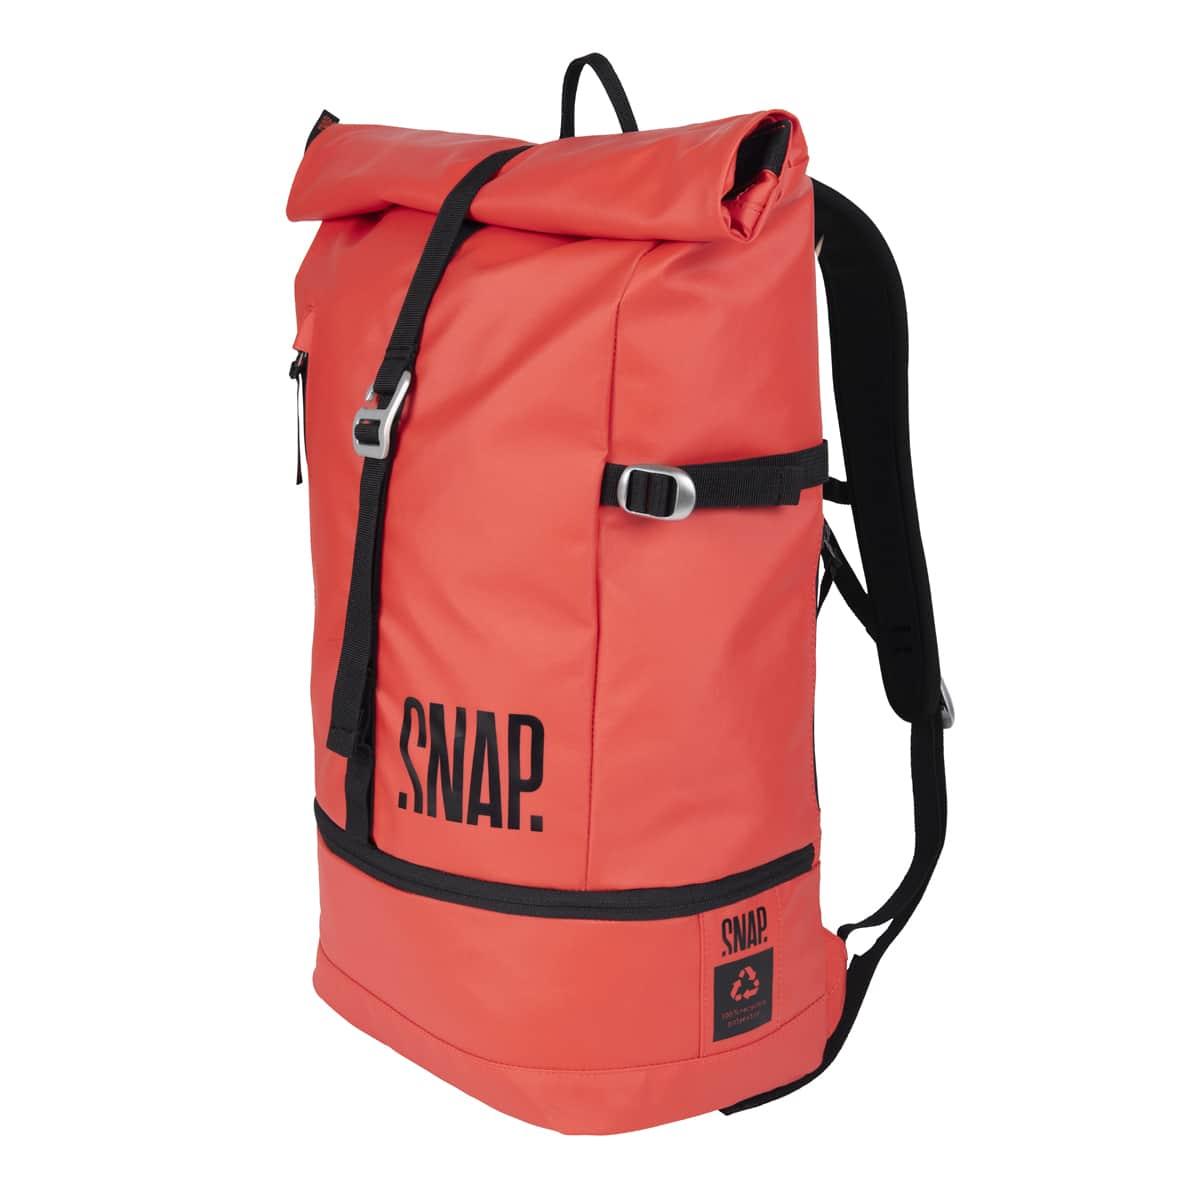 grenadine backpack roll top shape